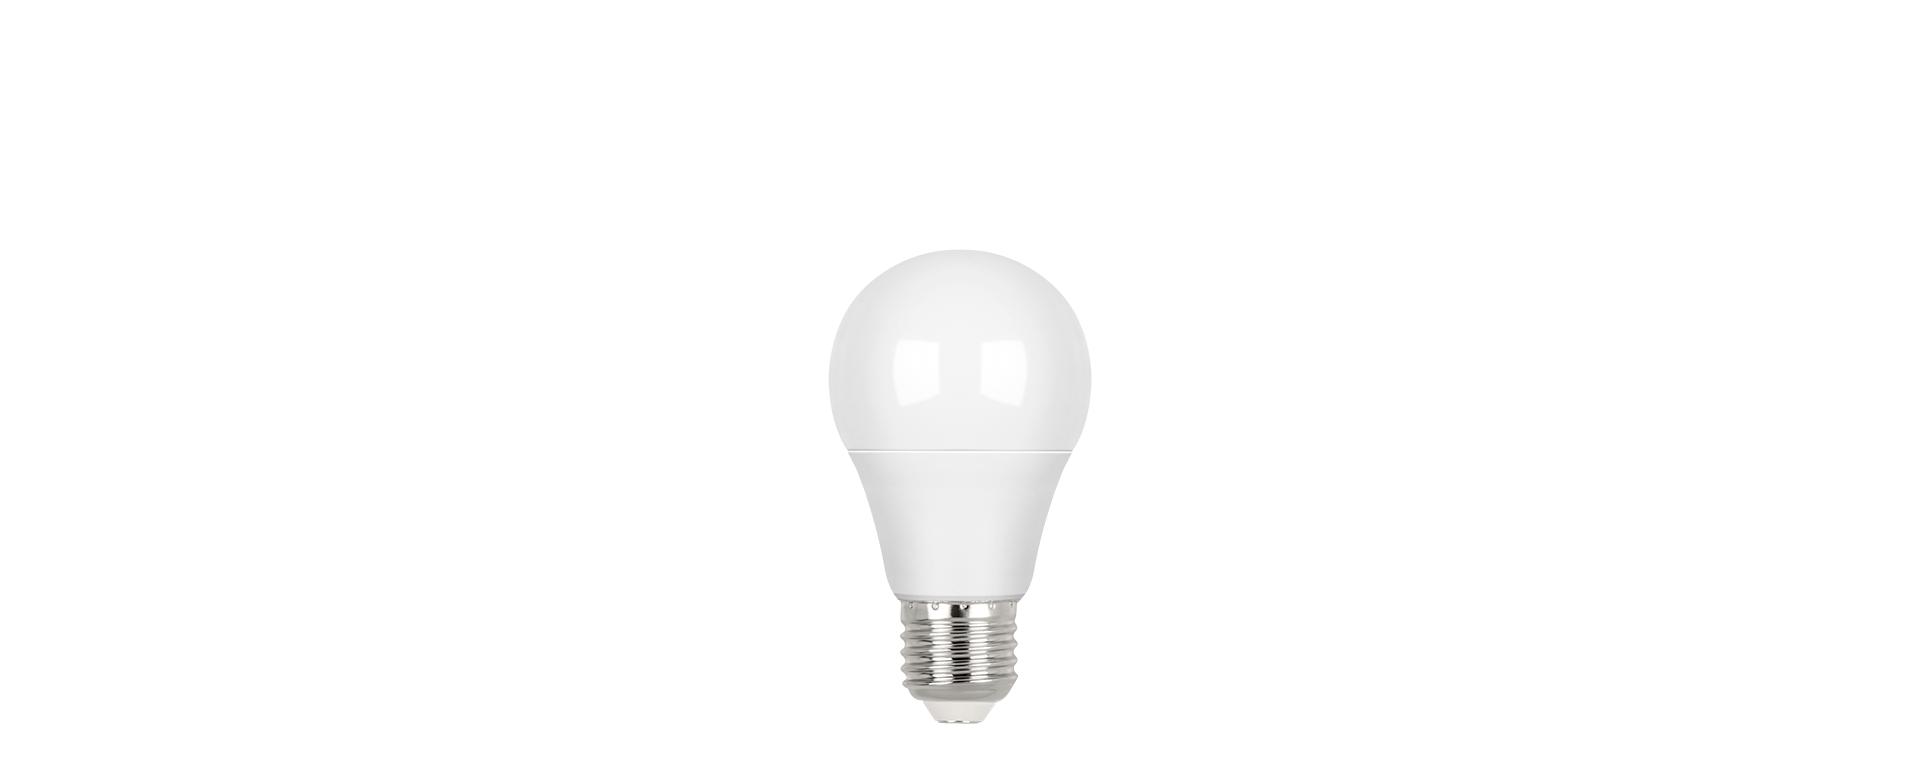 LÂMPADA LED BULBO 9W 4000K BRANCO NEUTRO 806lm  STH8265/40- STELLA